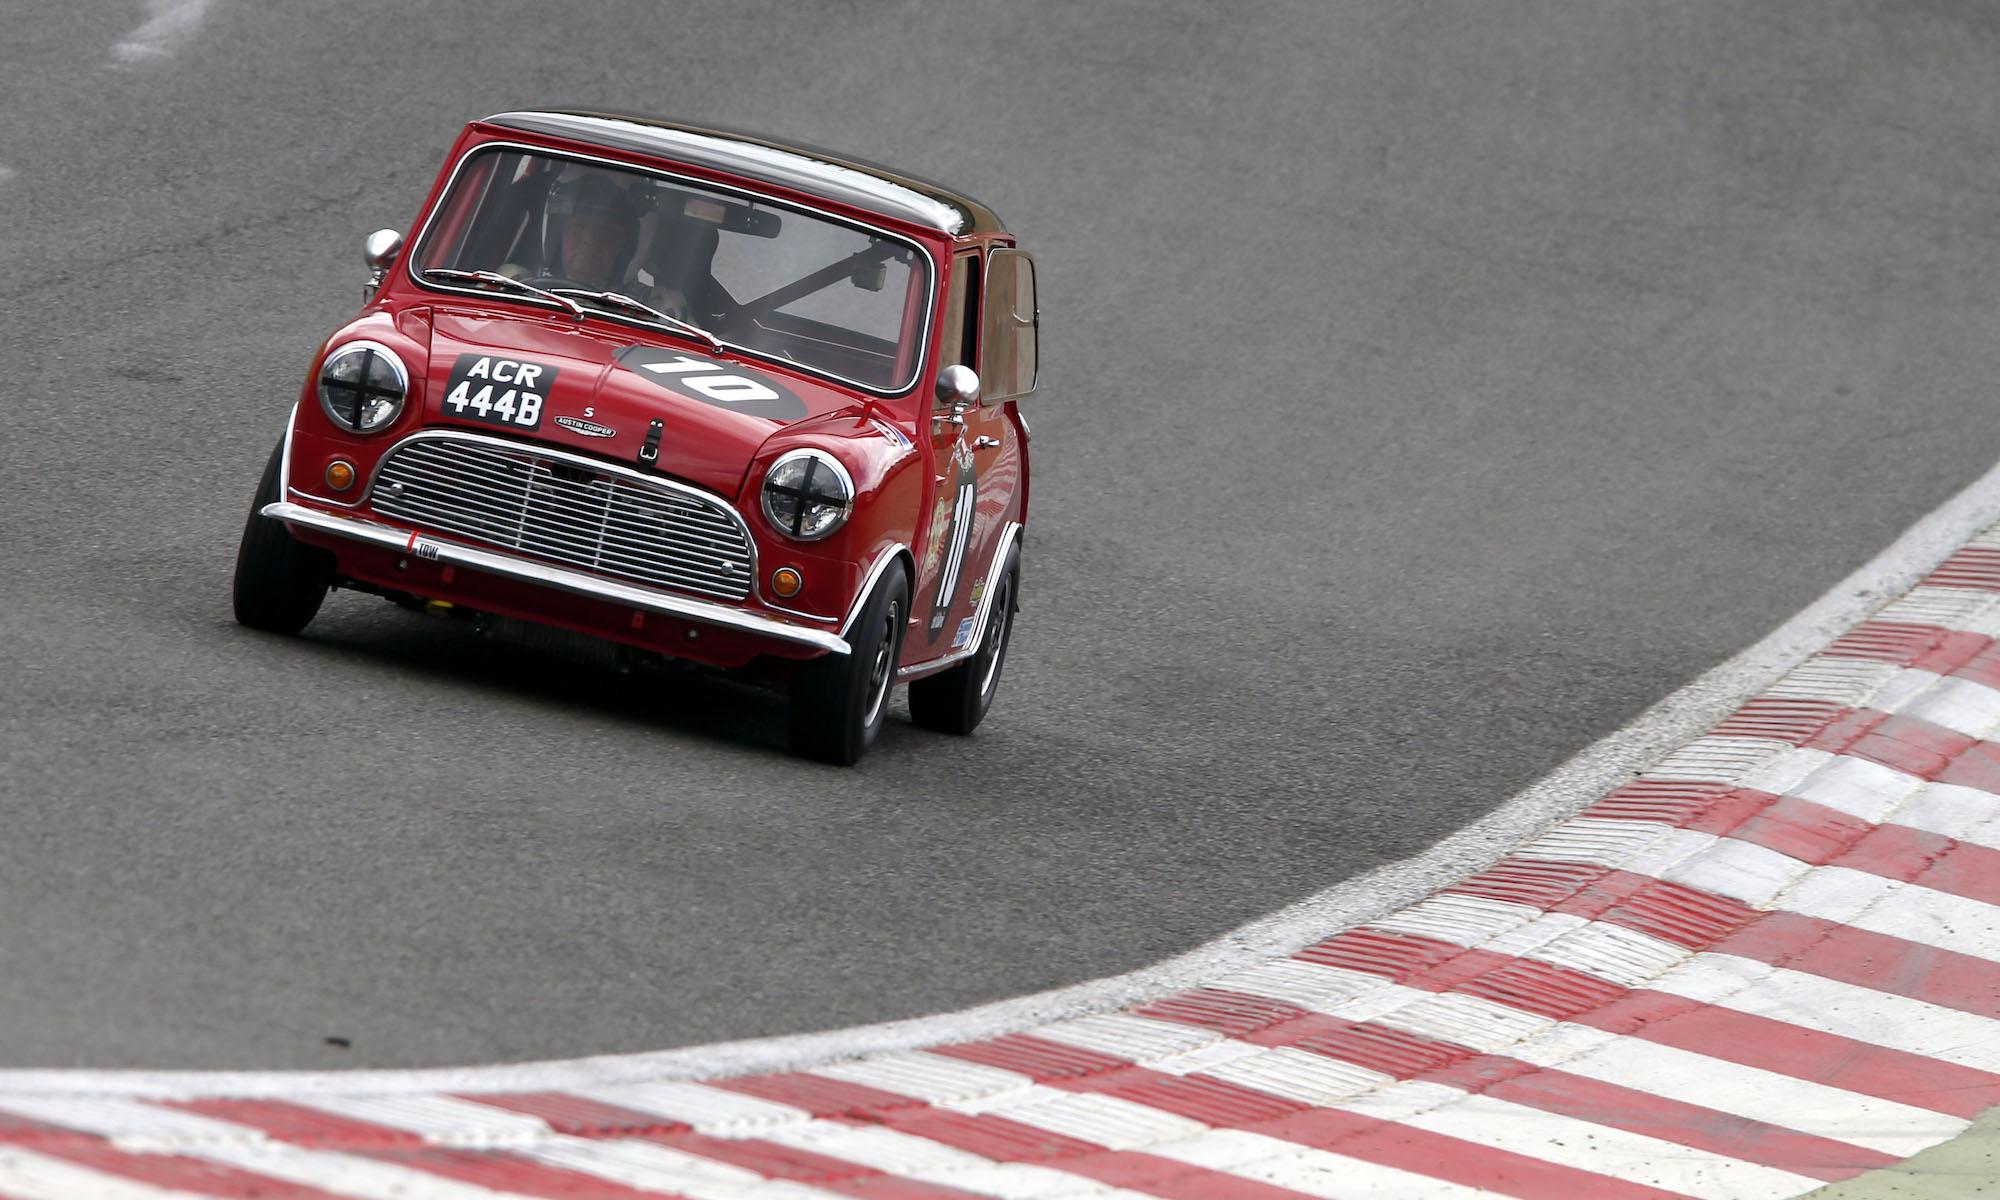 Cck Historic New Book How To Prepare A Historic Racing Mini